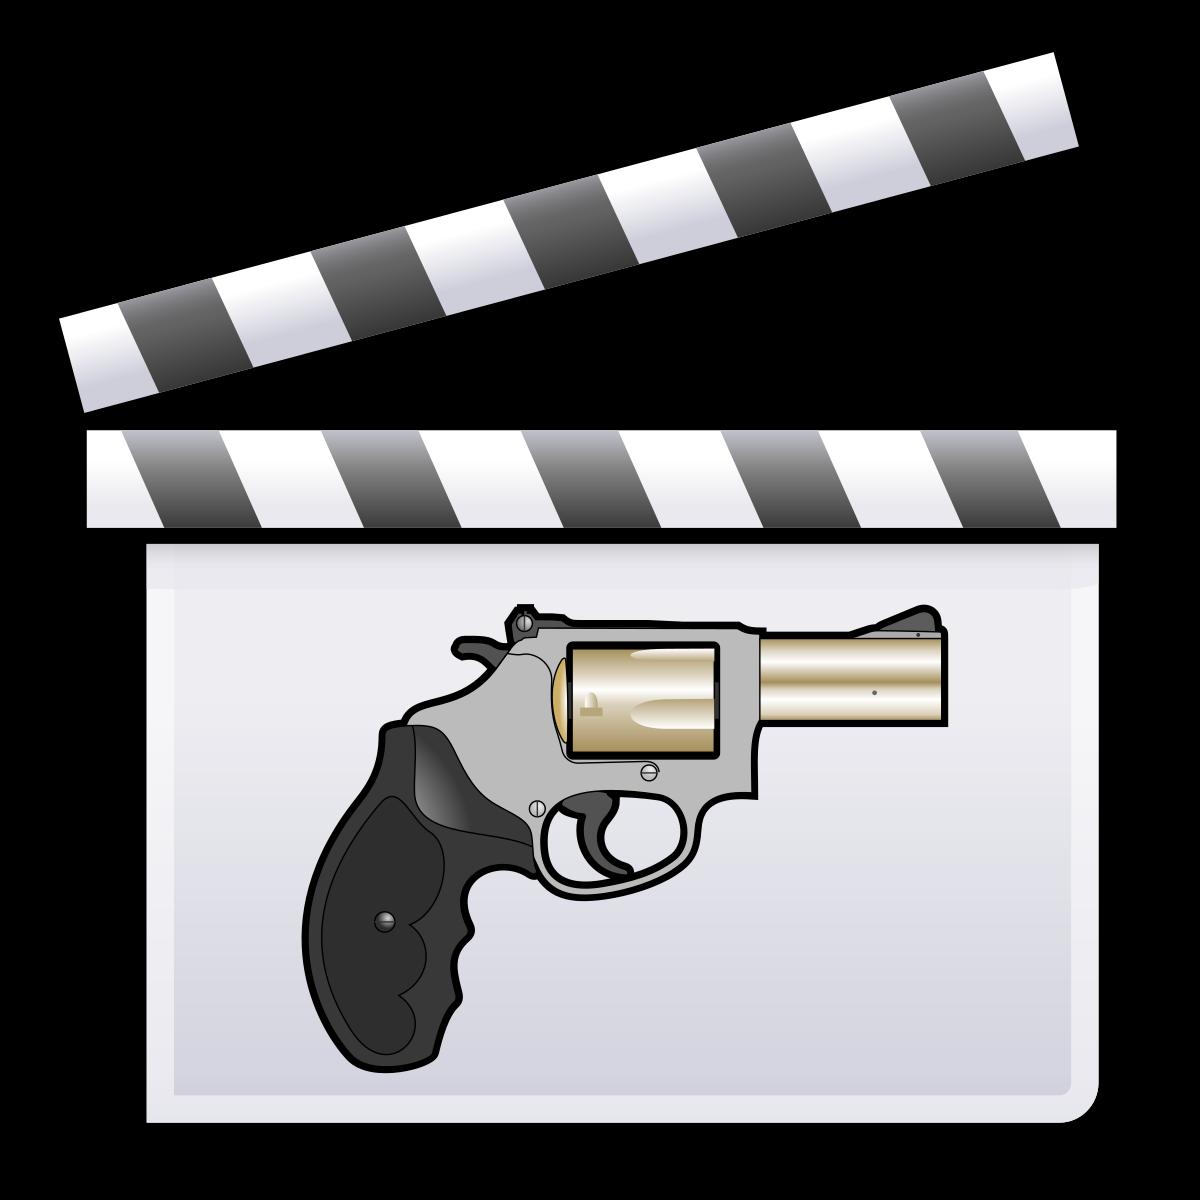 Crime clipart criminal face. List of films the